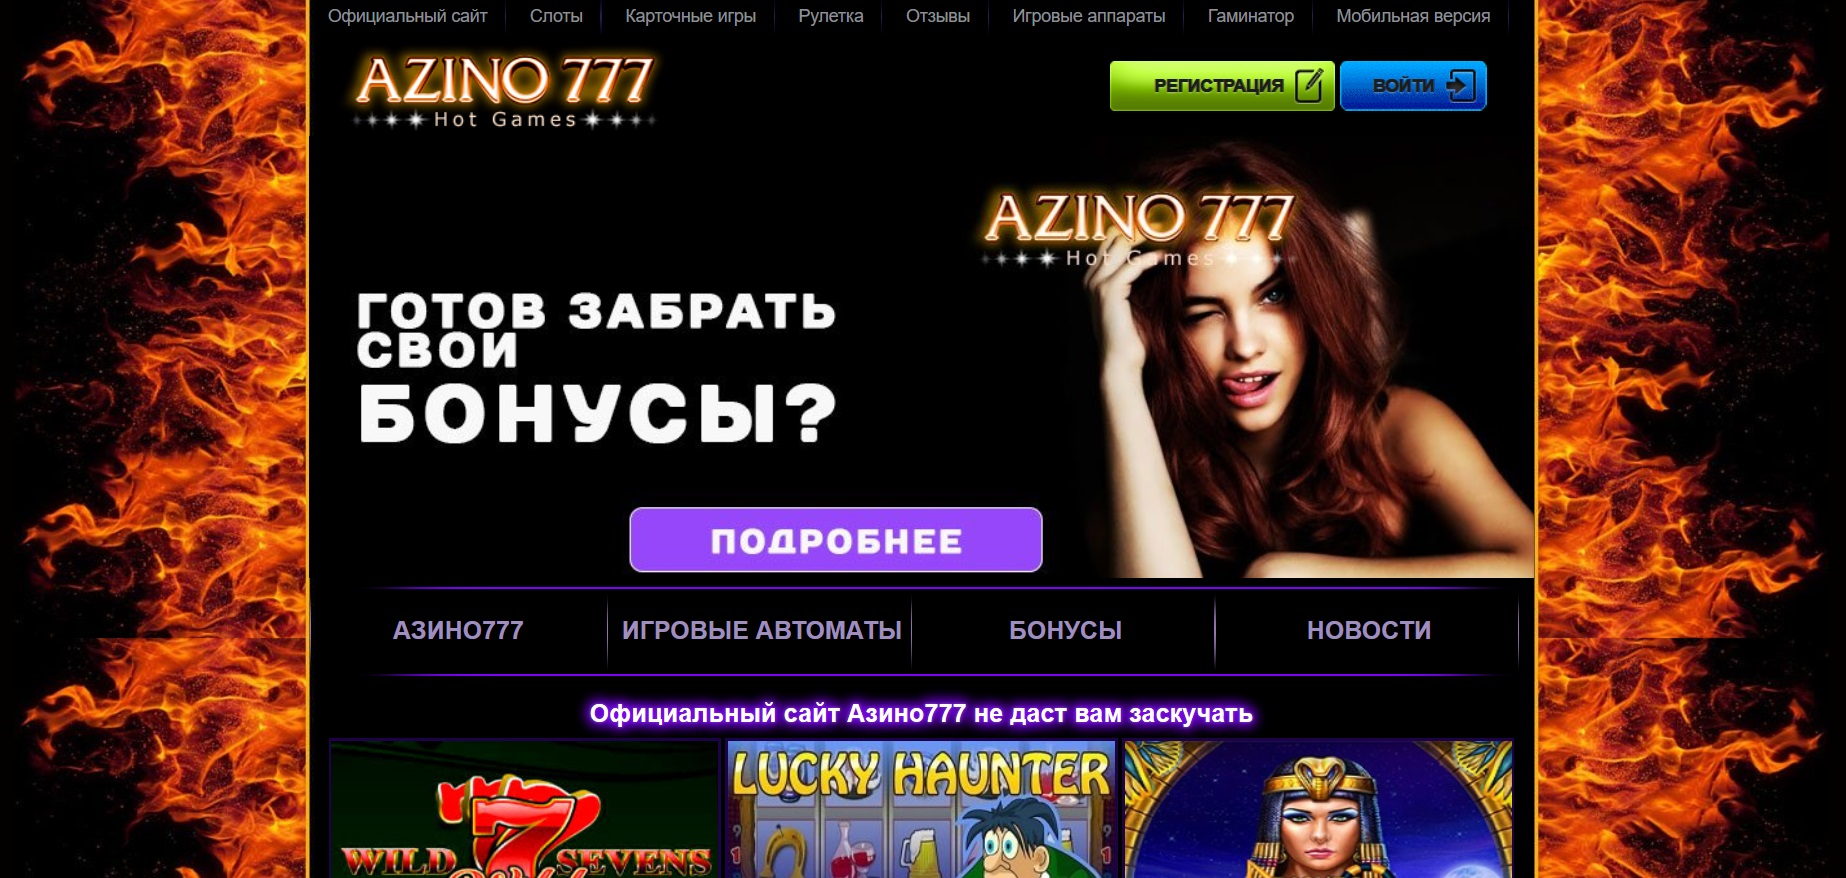 официальный сайт azino777 официальный сайт мобильная версия зеркало